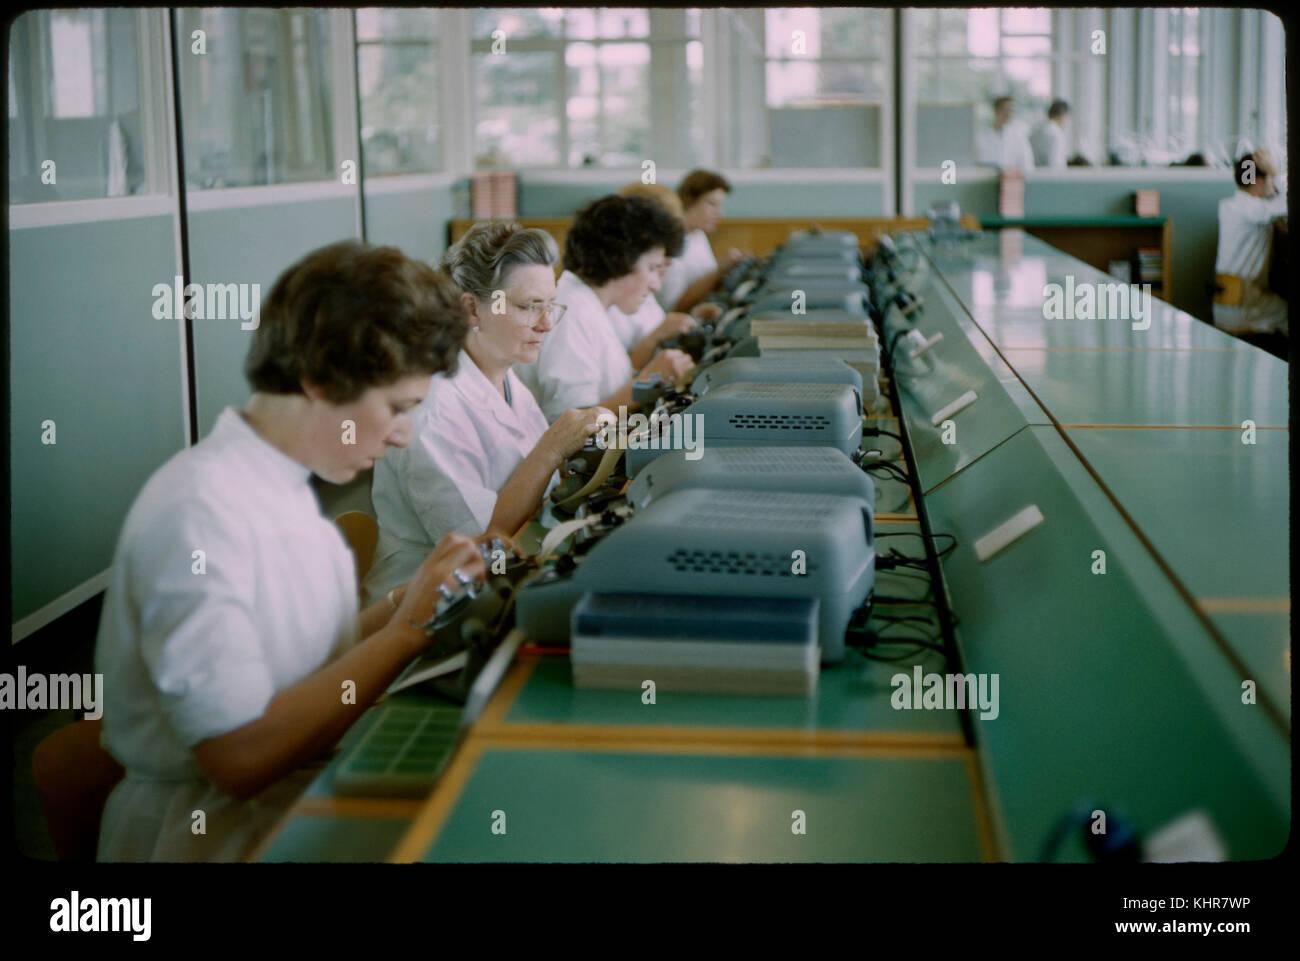 Historical Factory Stock Photos & Historical Factory Stock ...